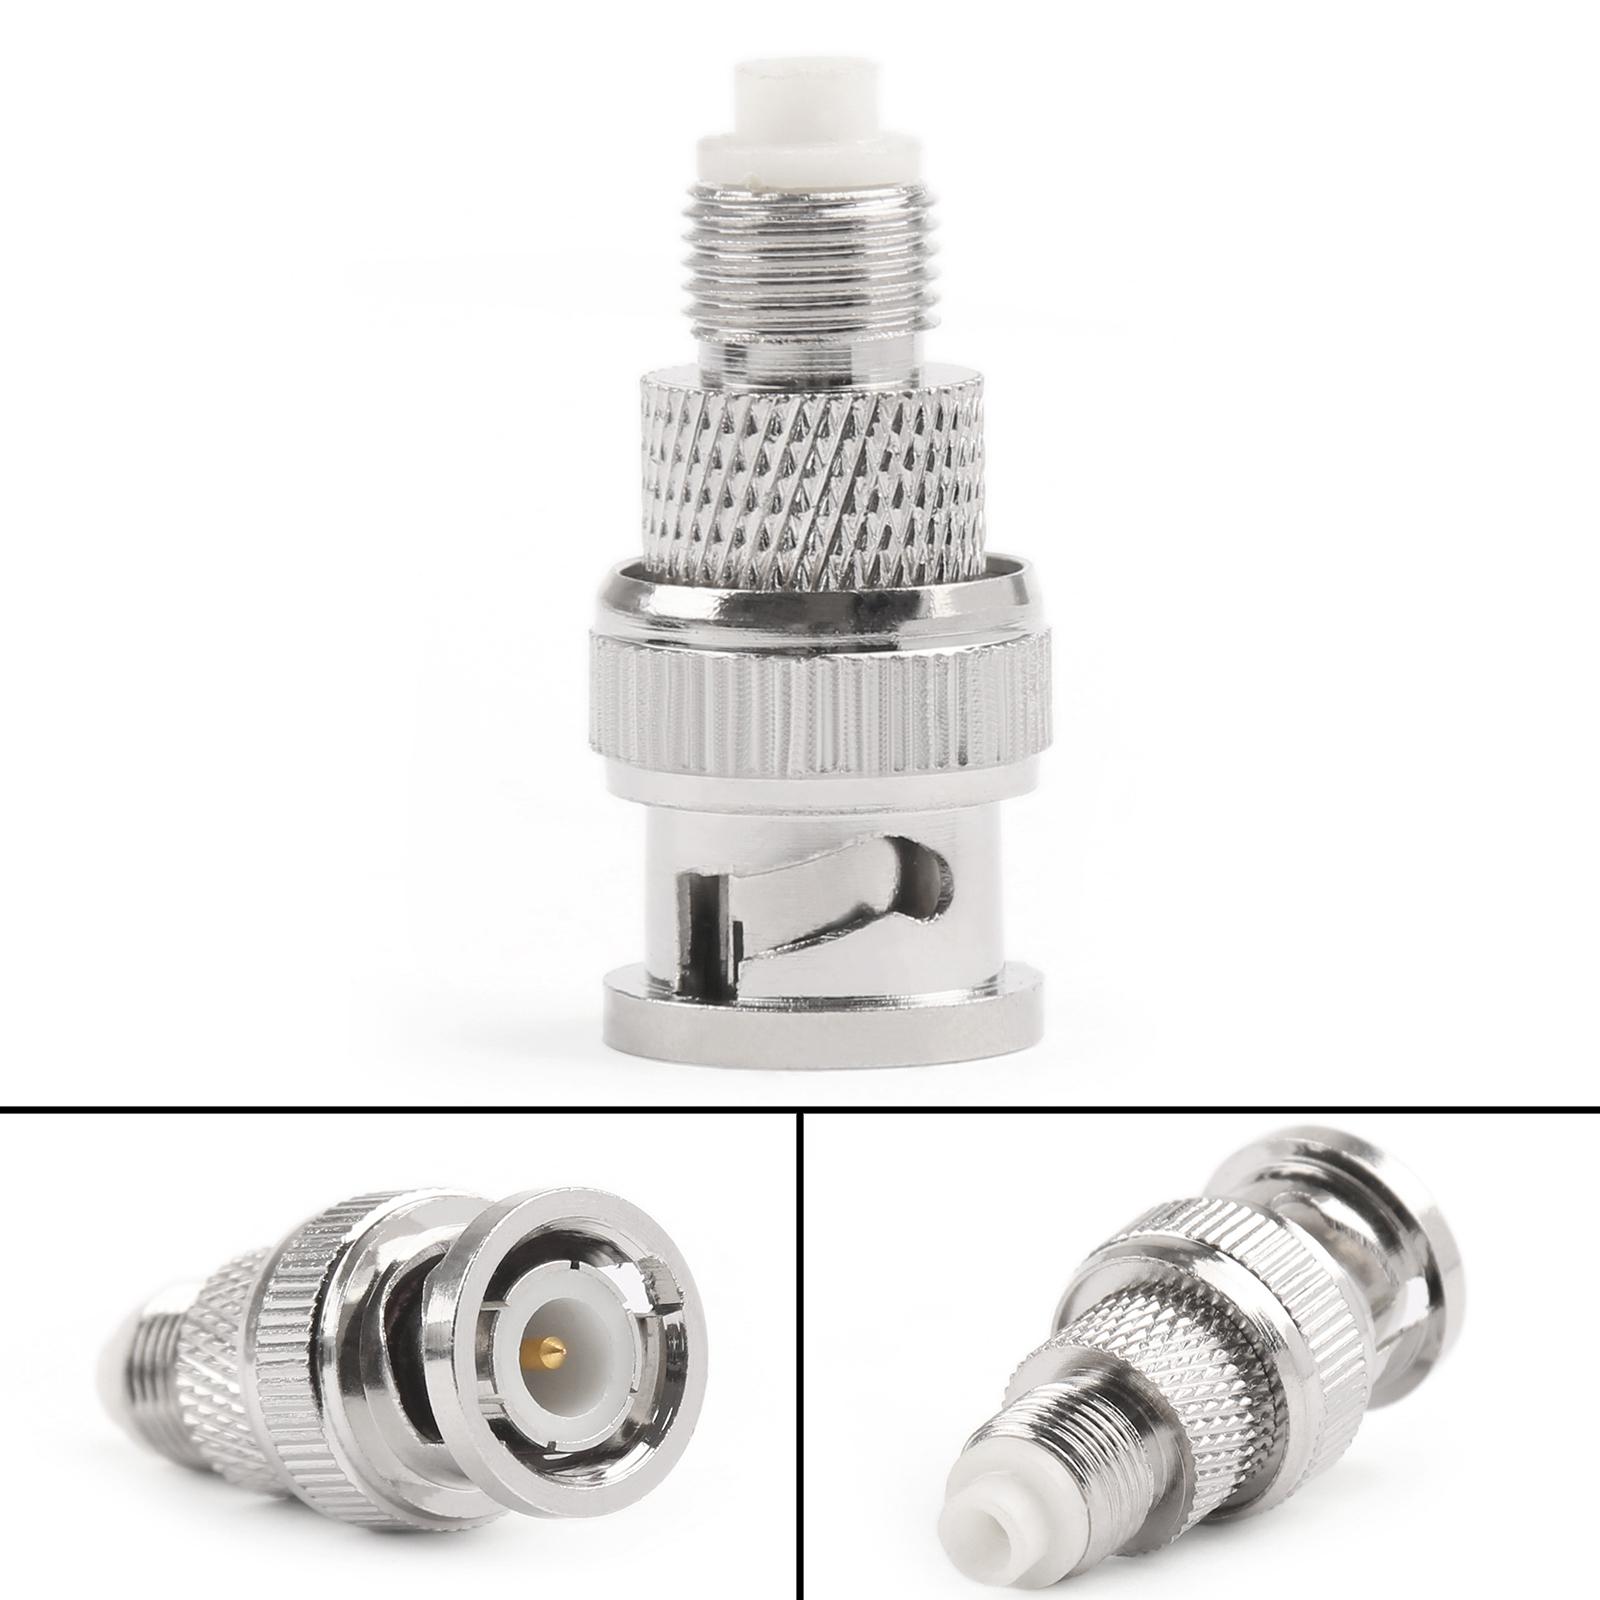 Straight 50 Ohm RF Adaptateur FME Plug to BNC Plug